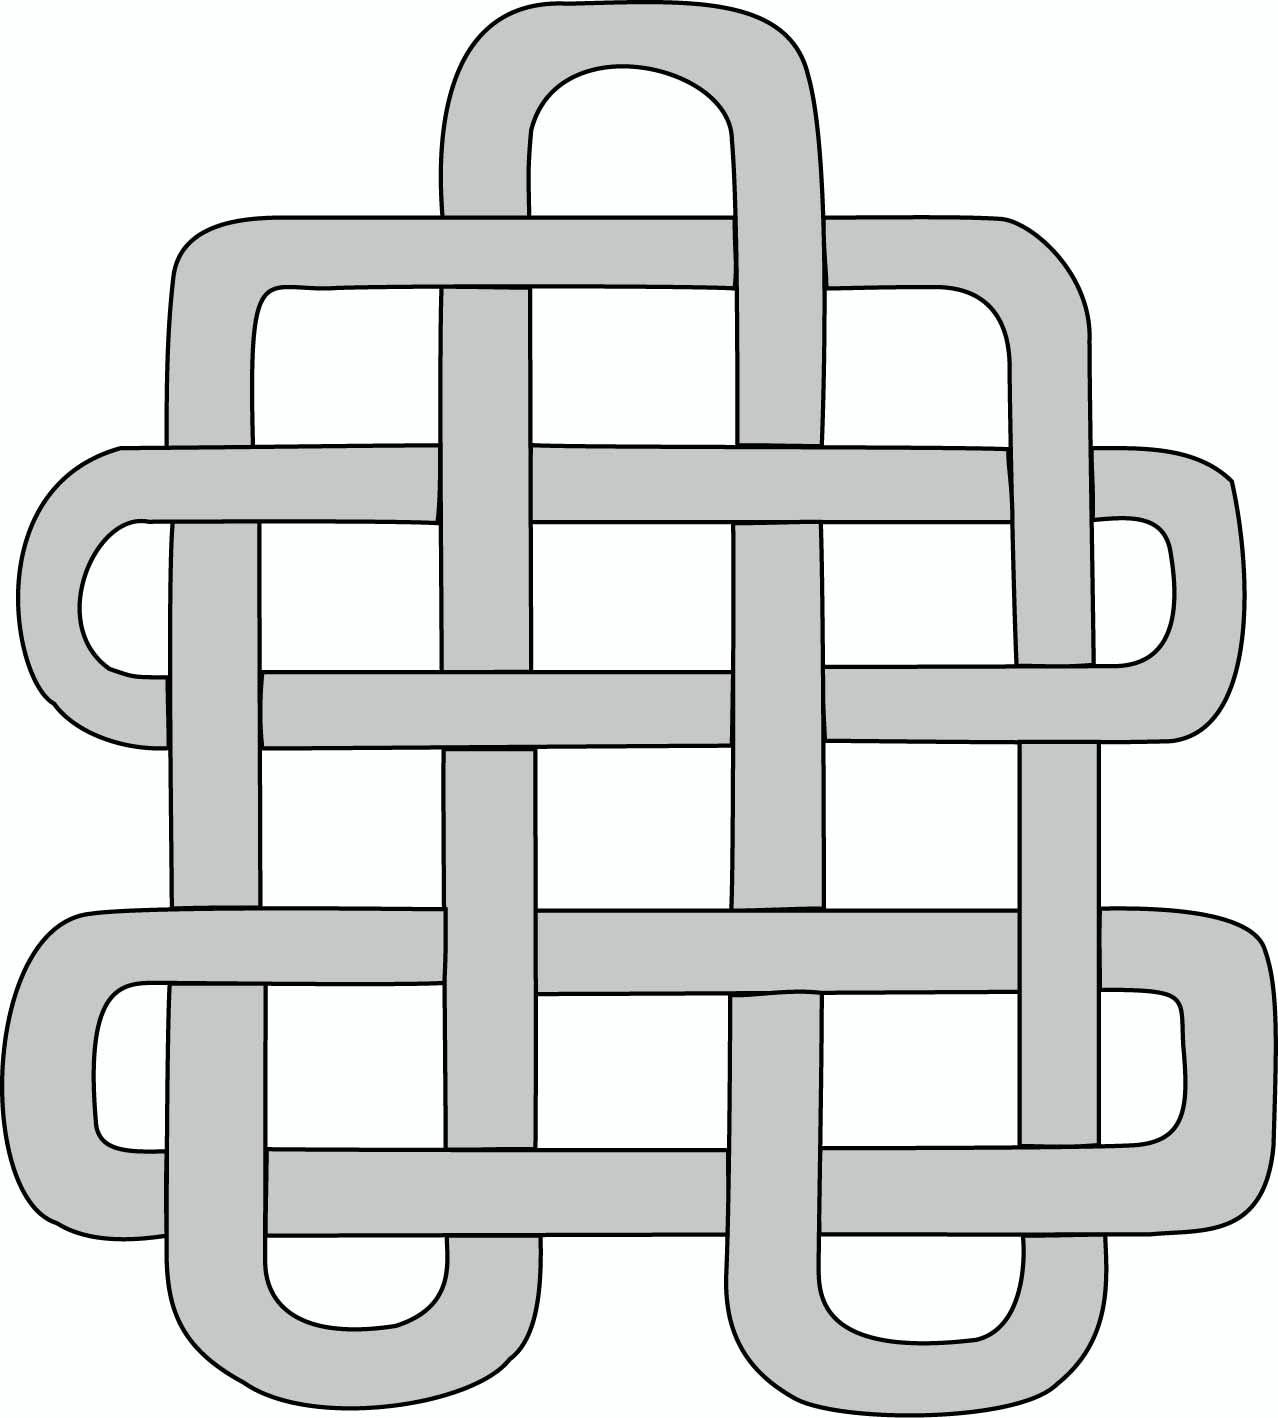 House of brian boru obrien clan heraldry ill14b obrien knot biocorpaavc Images